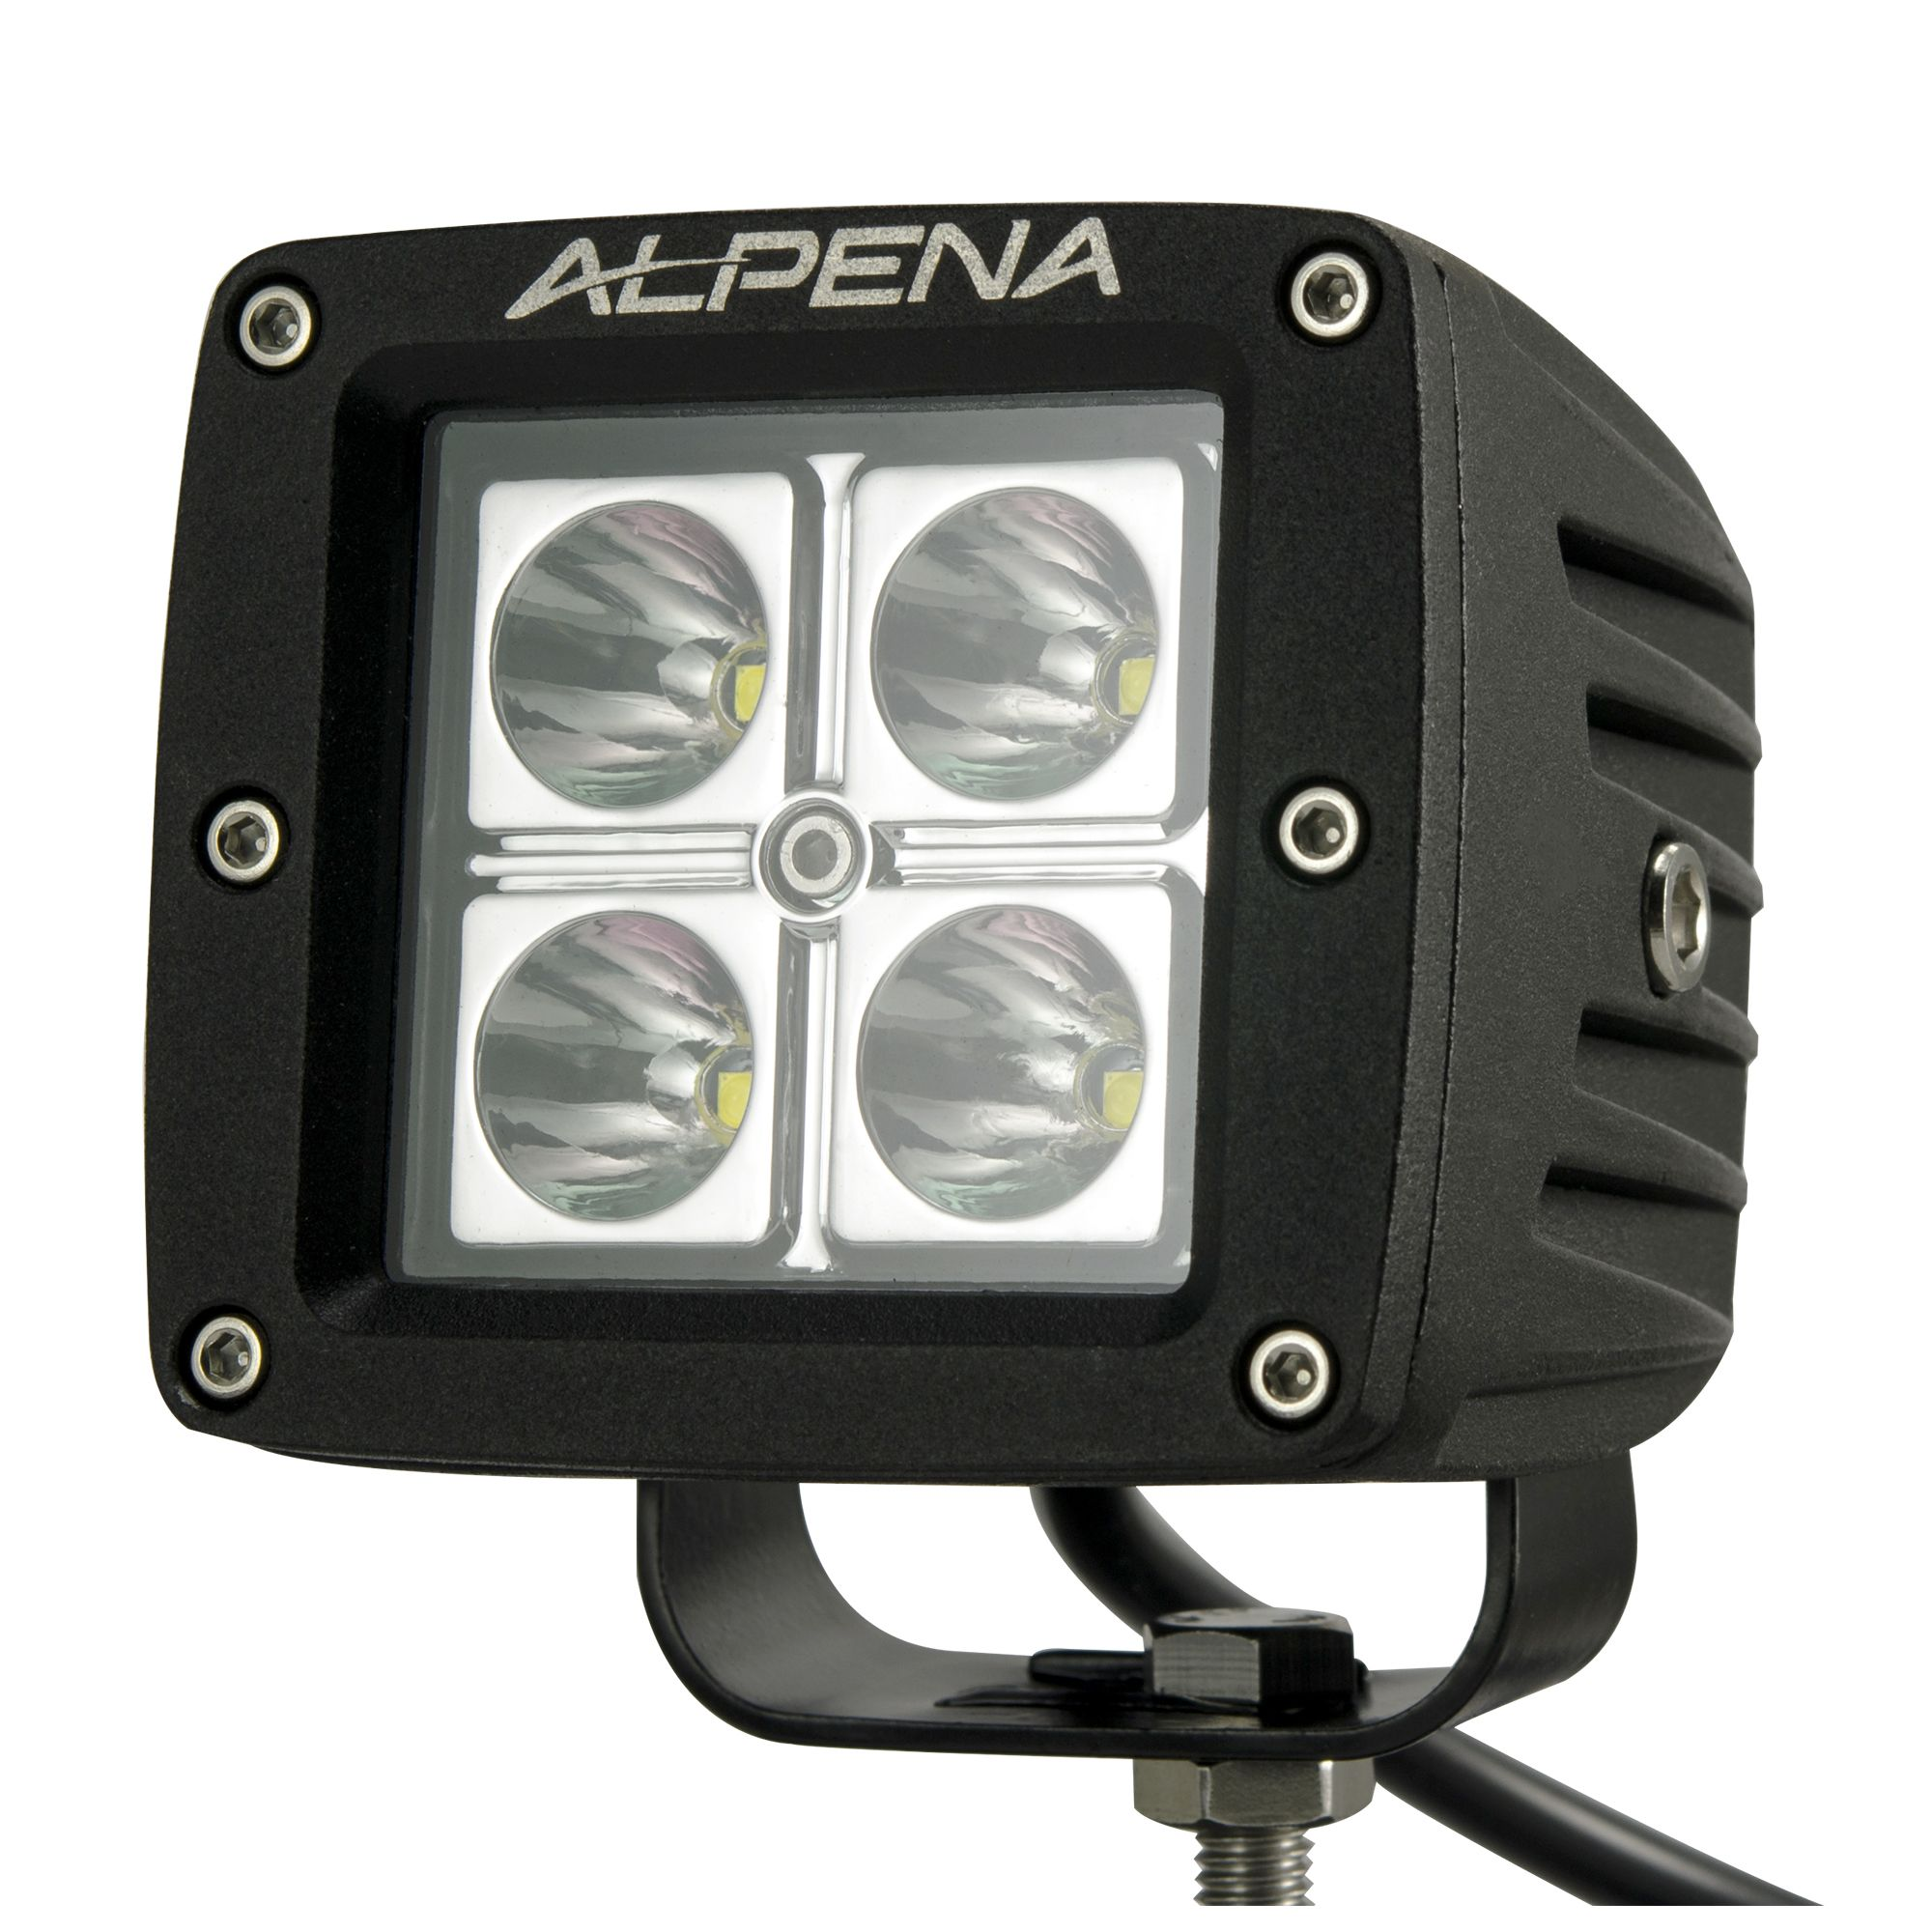 Groß Alpena Led Lights Installation Ideen - Der Schaltplan ...